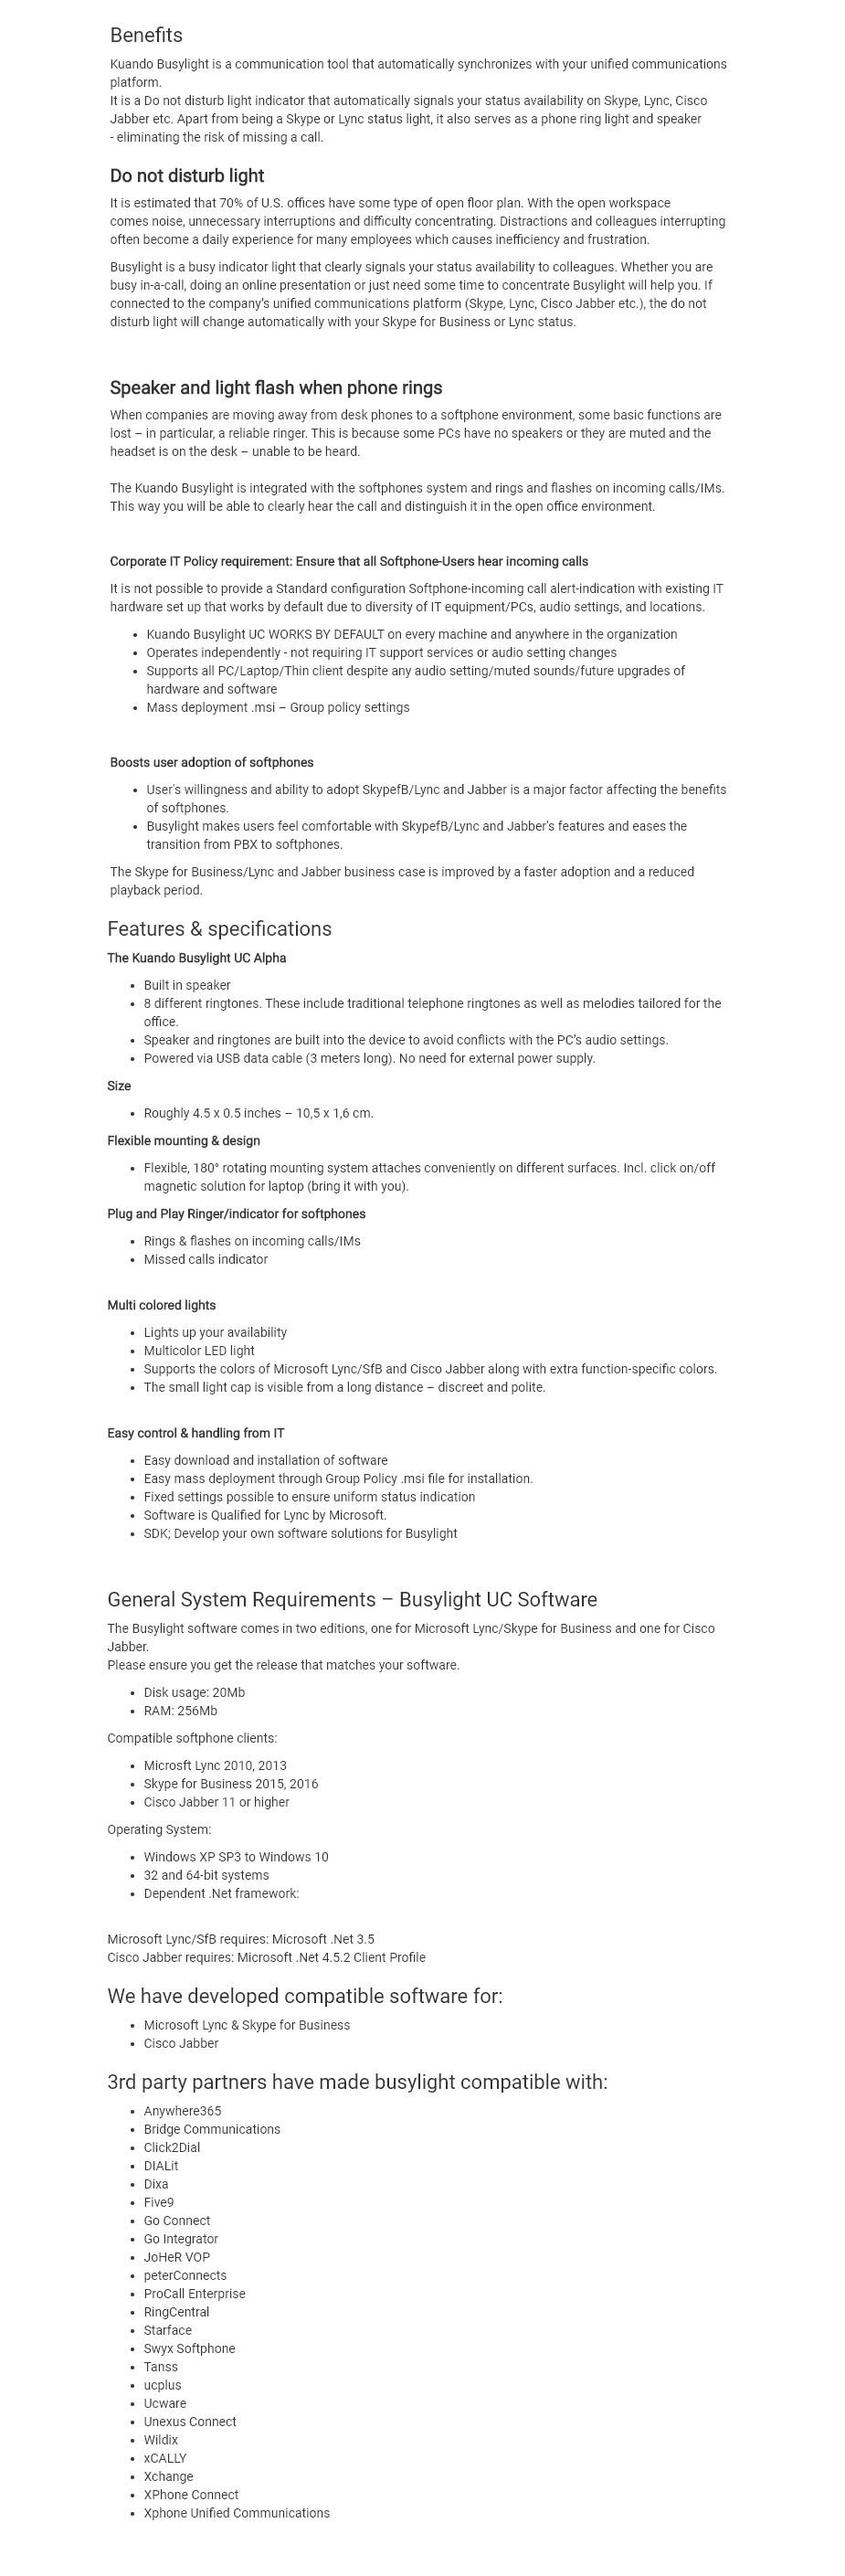 Kuando Busylight UC Alpha - Overview 1